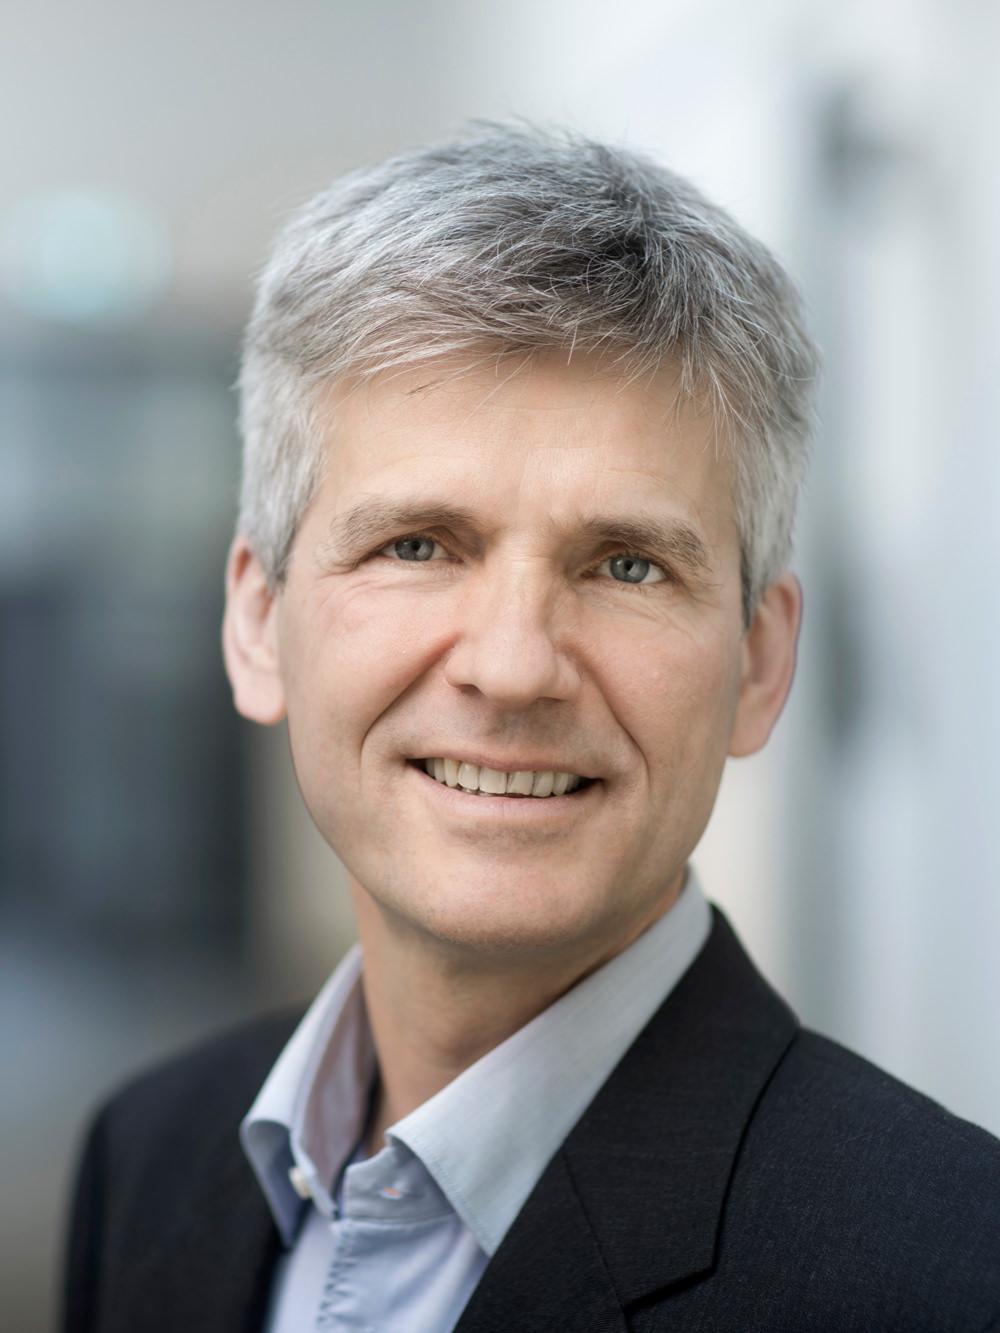 Geschäftsführer Dipl. Ing. Andre Jenkel